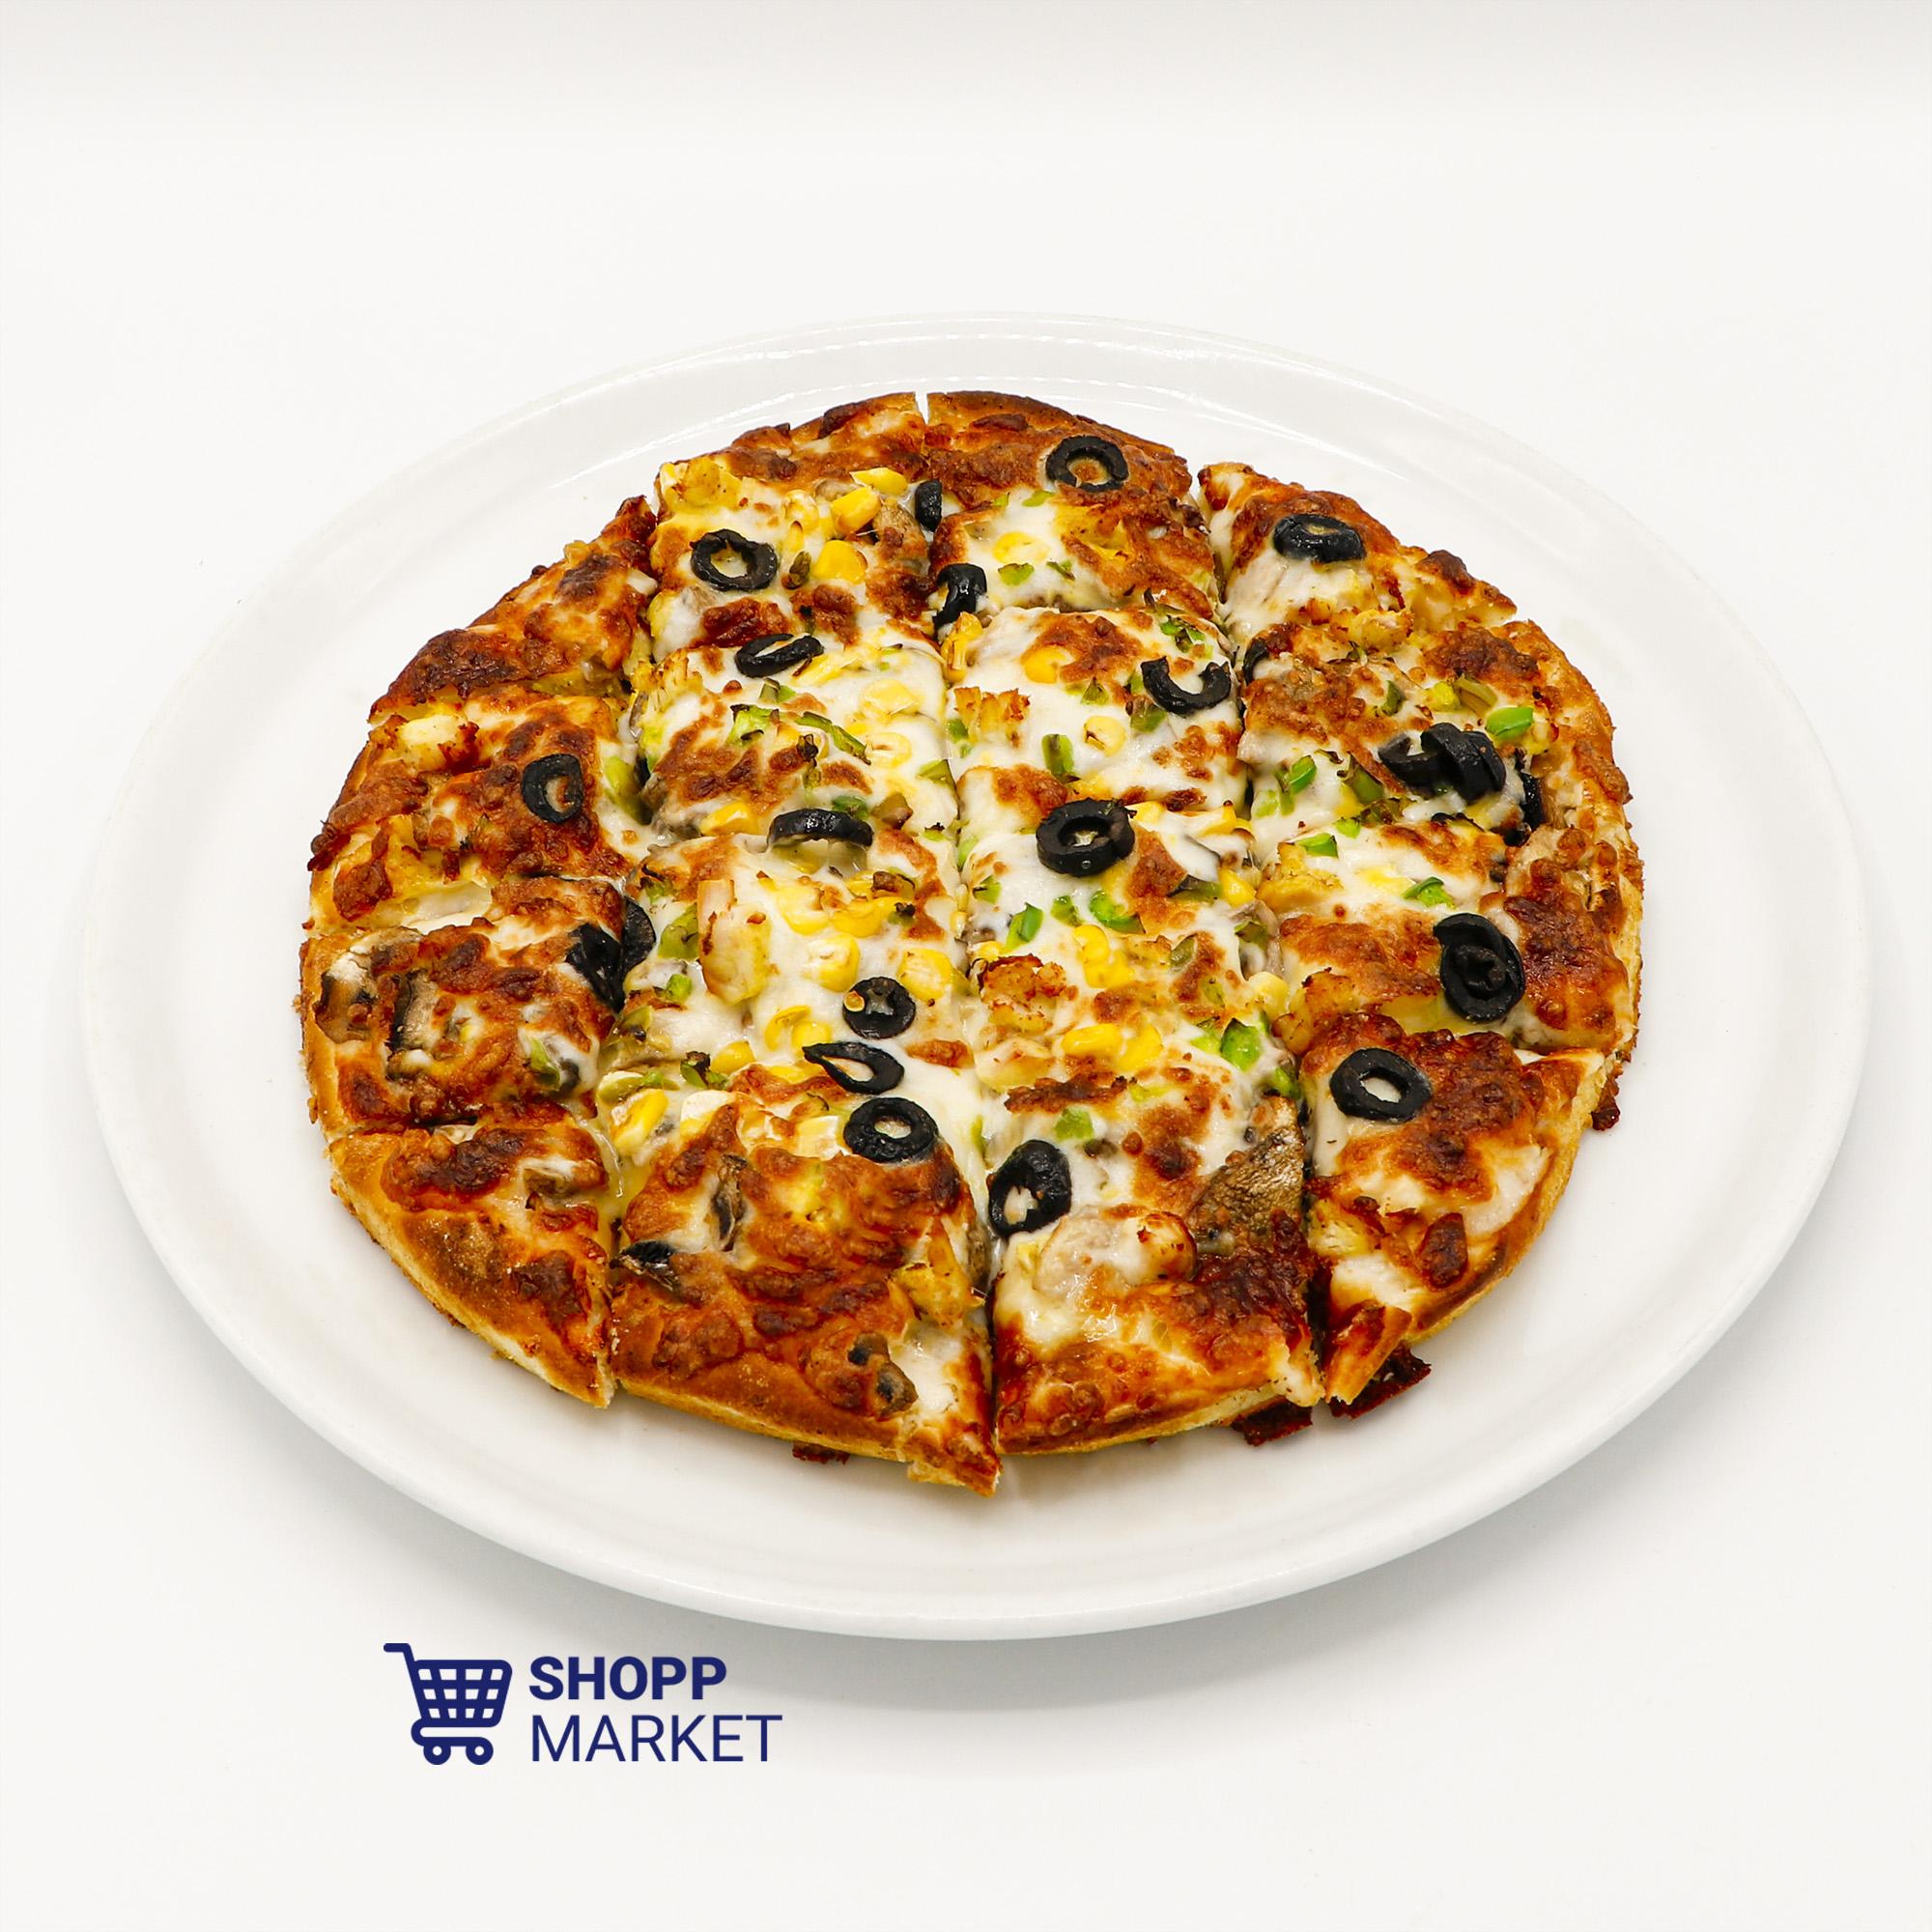 پیتزا اسپشیال ویژه یک نفره